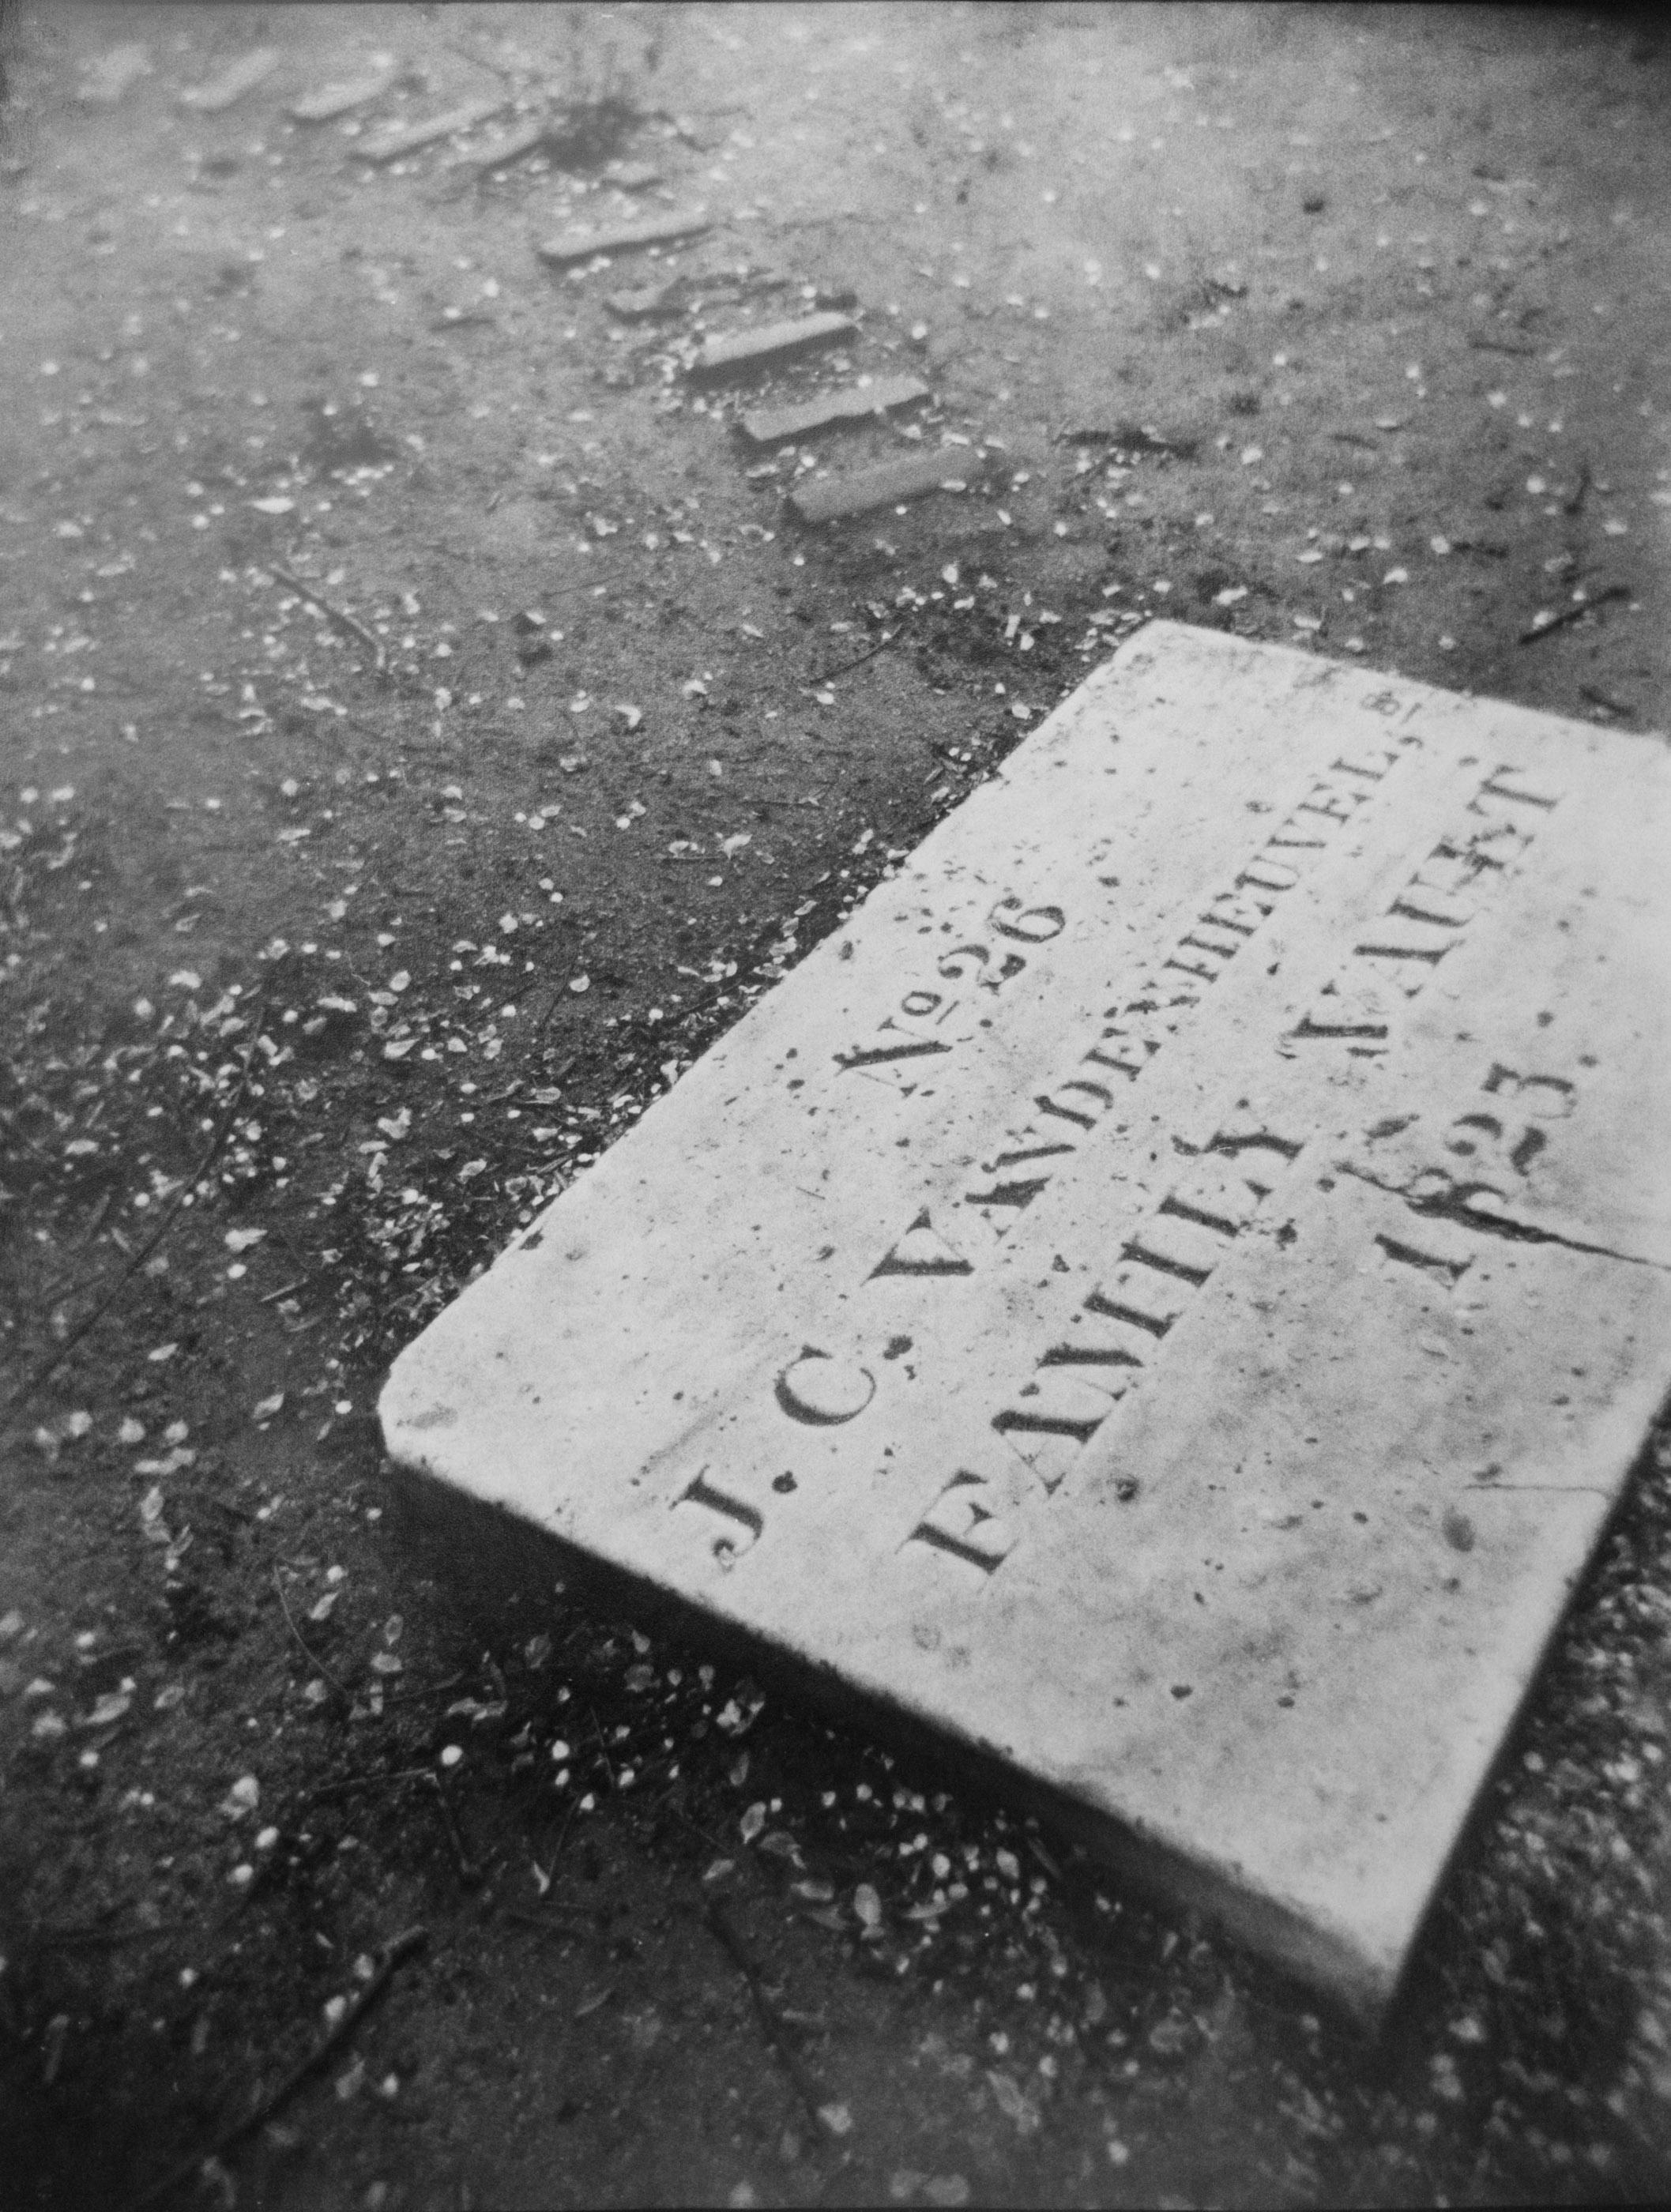 9_Grave Ground_St. Mark's Church-in-the-Bowerie, 1999-2000_.jpg